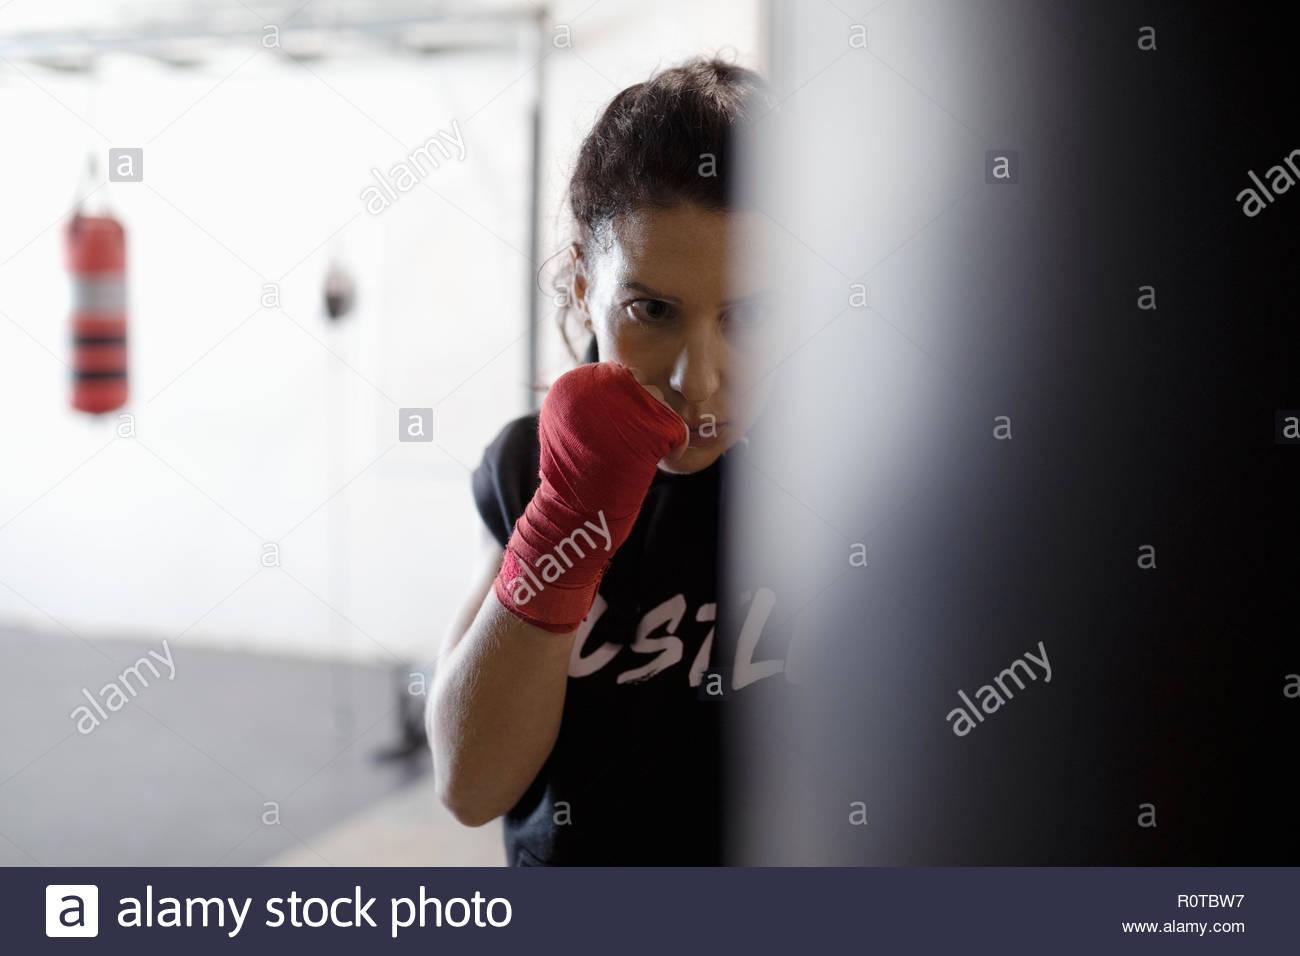 Tough, focused female boxer training at punching bag in gym - Stock Image